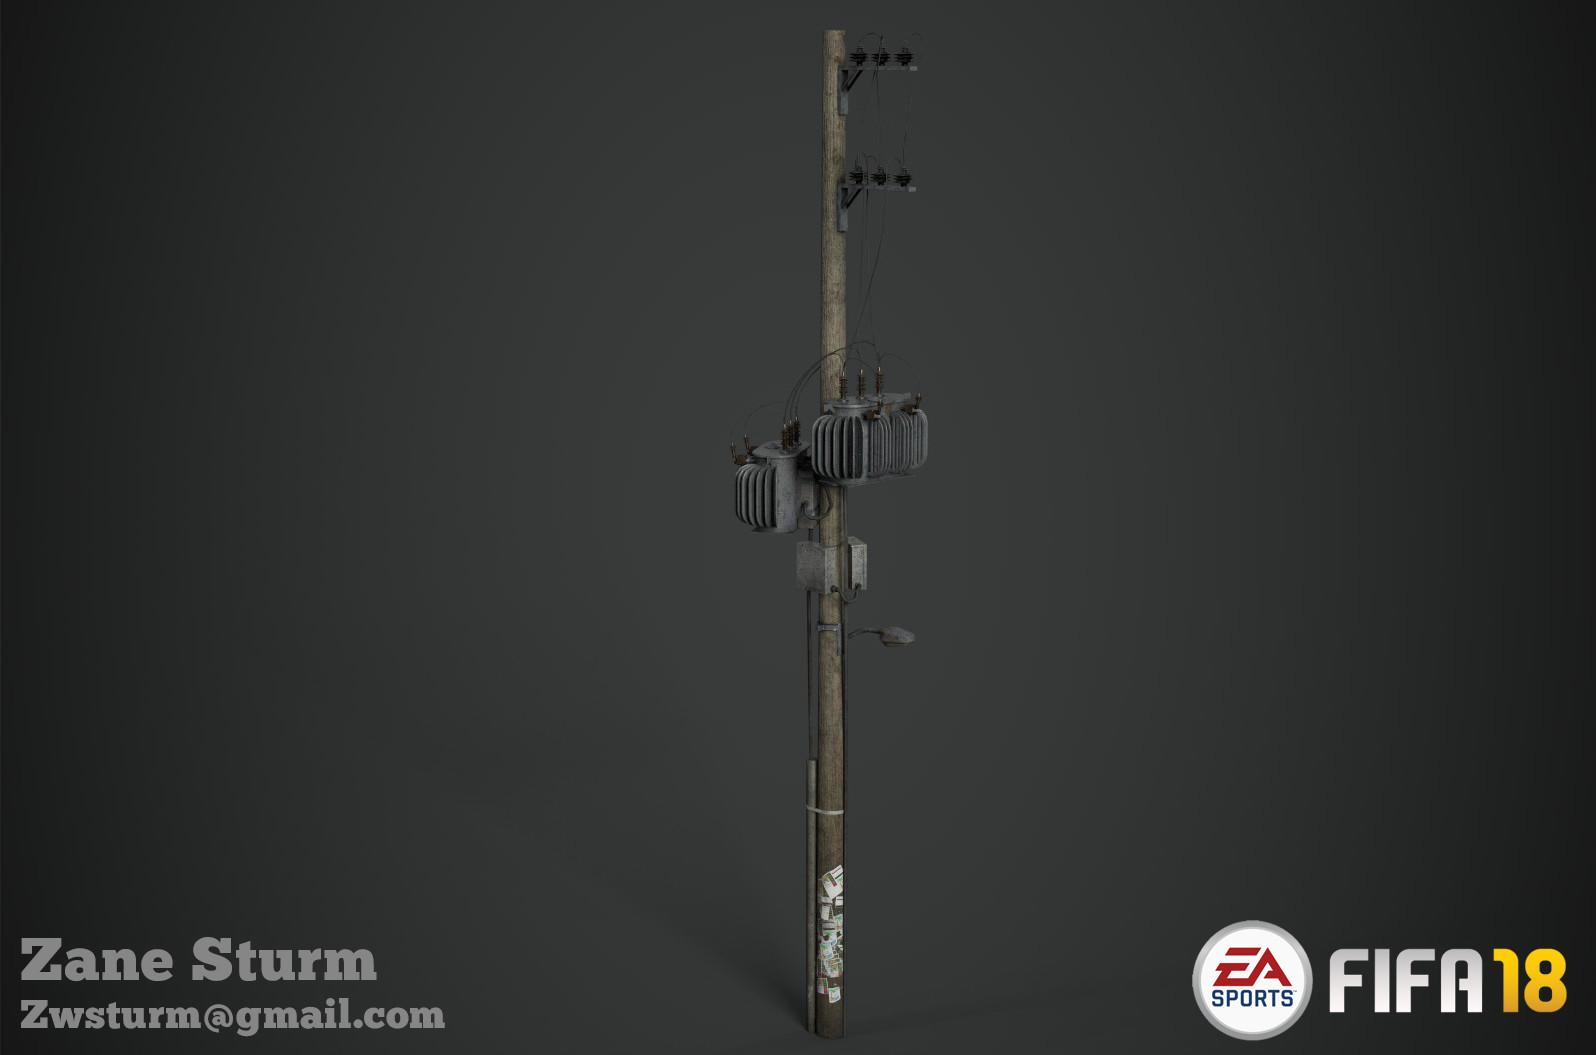 Zane sturm powerpole